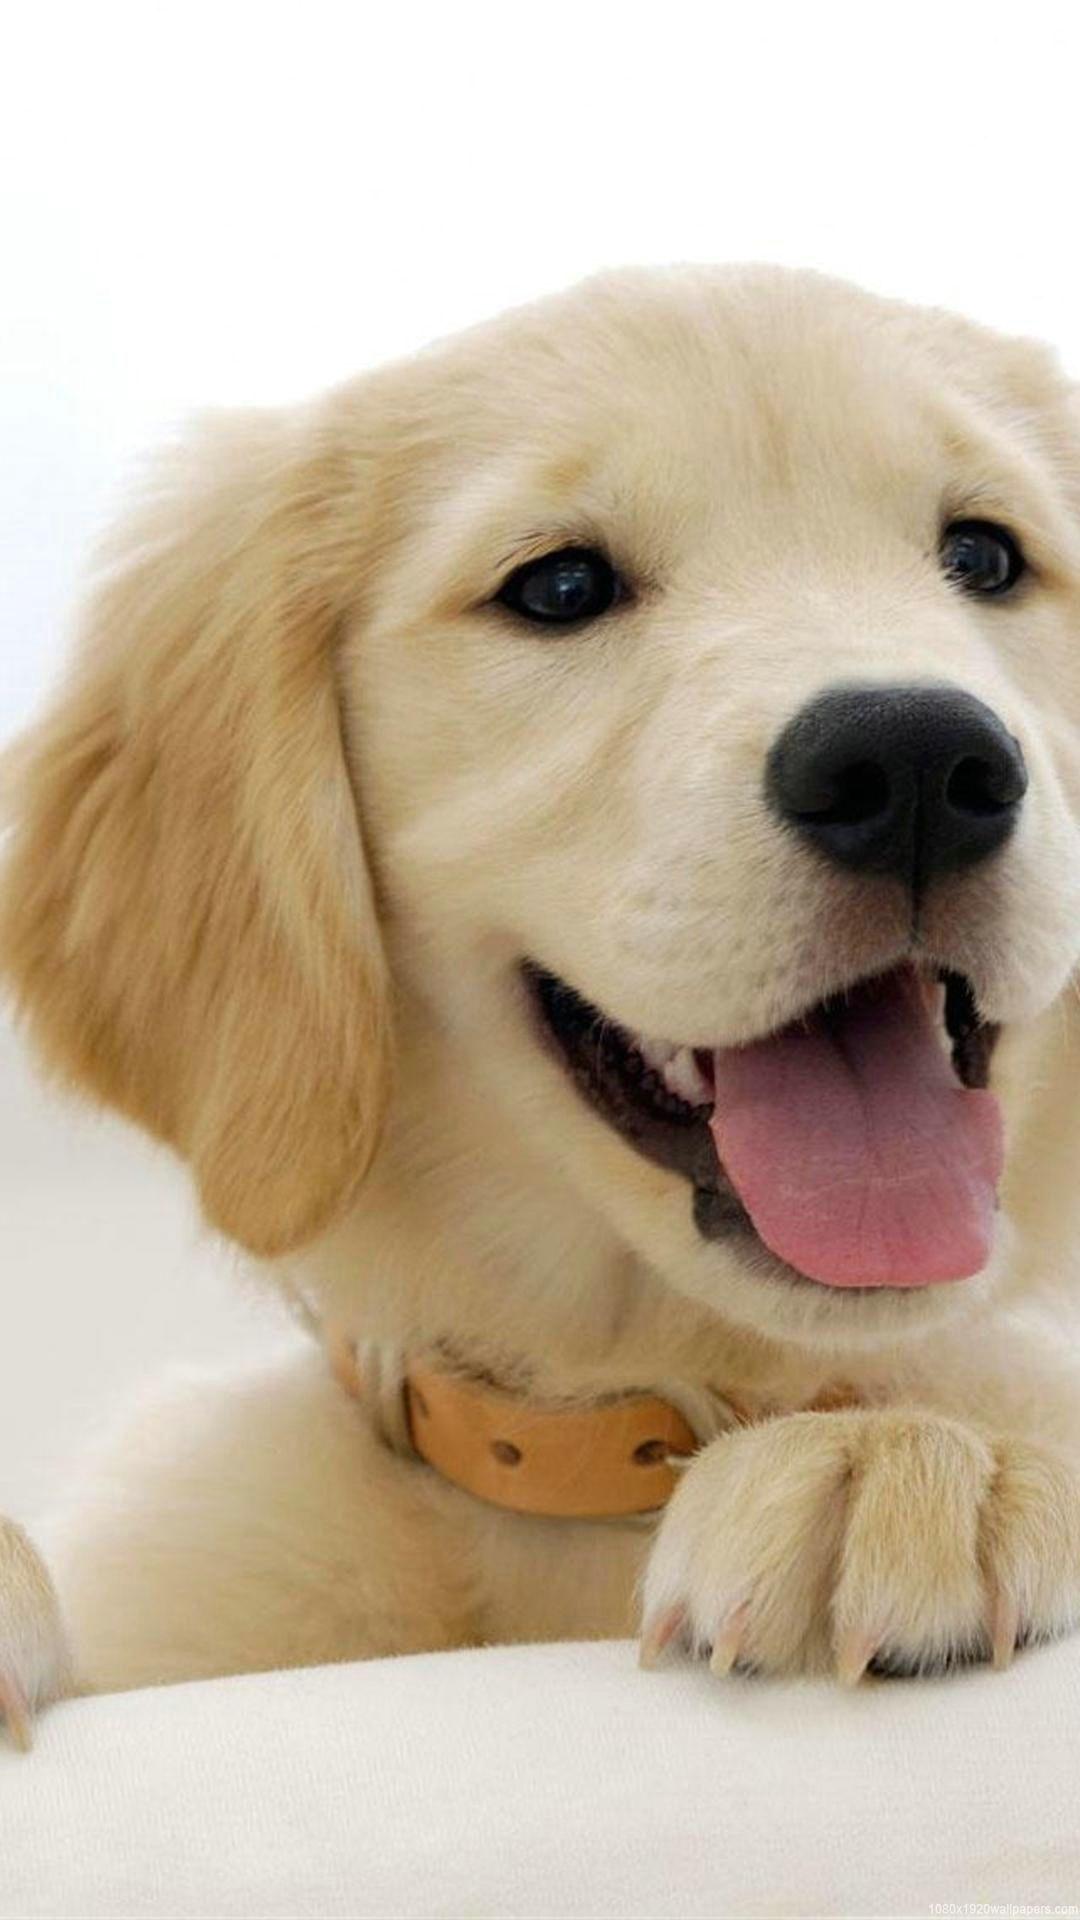 Golden Retriever Dog Wallpaper Android Animals Wallpapers Ideas